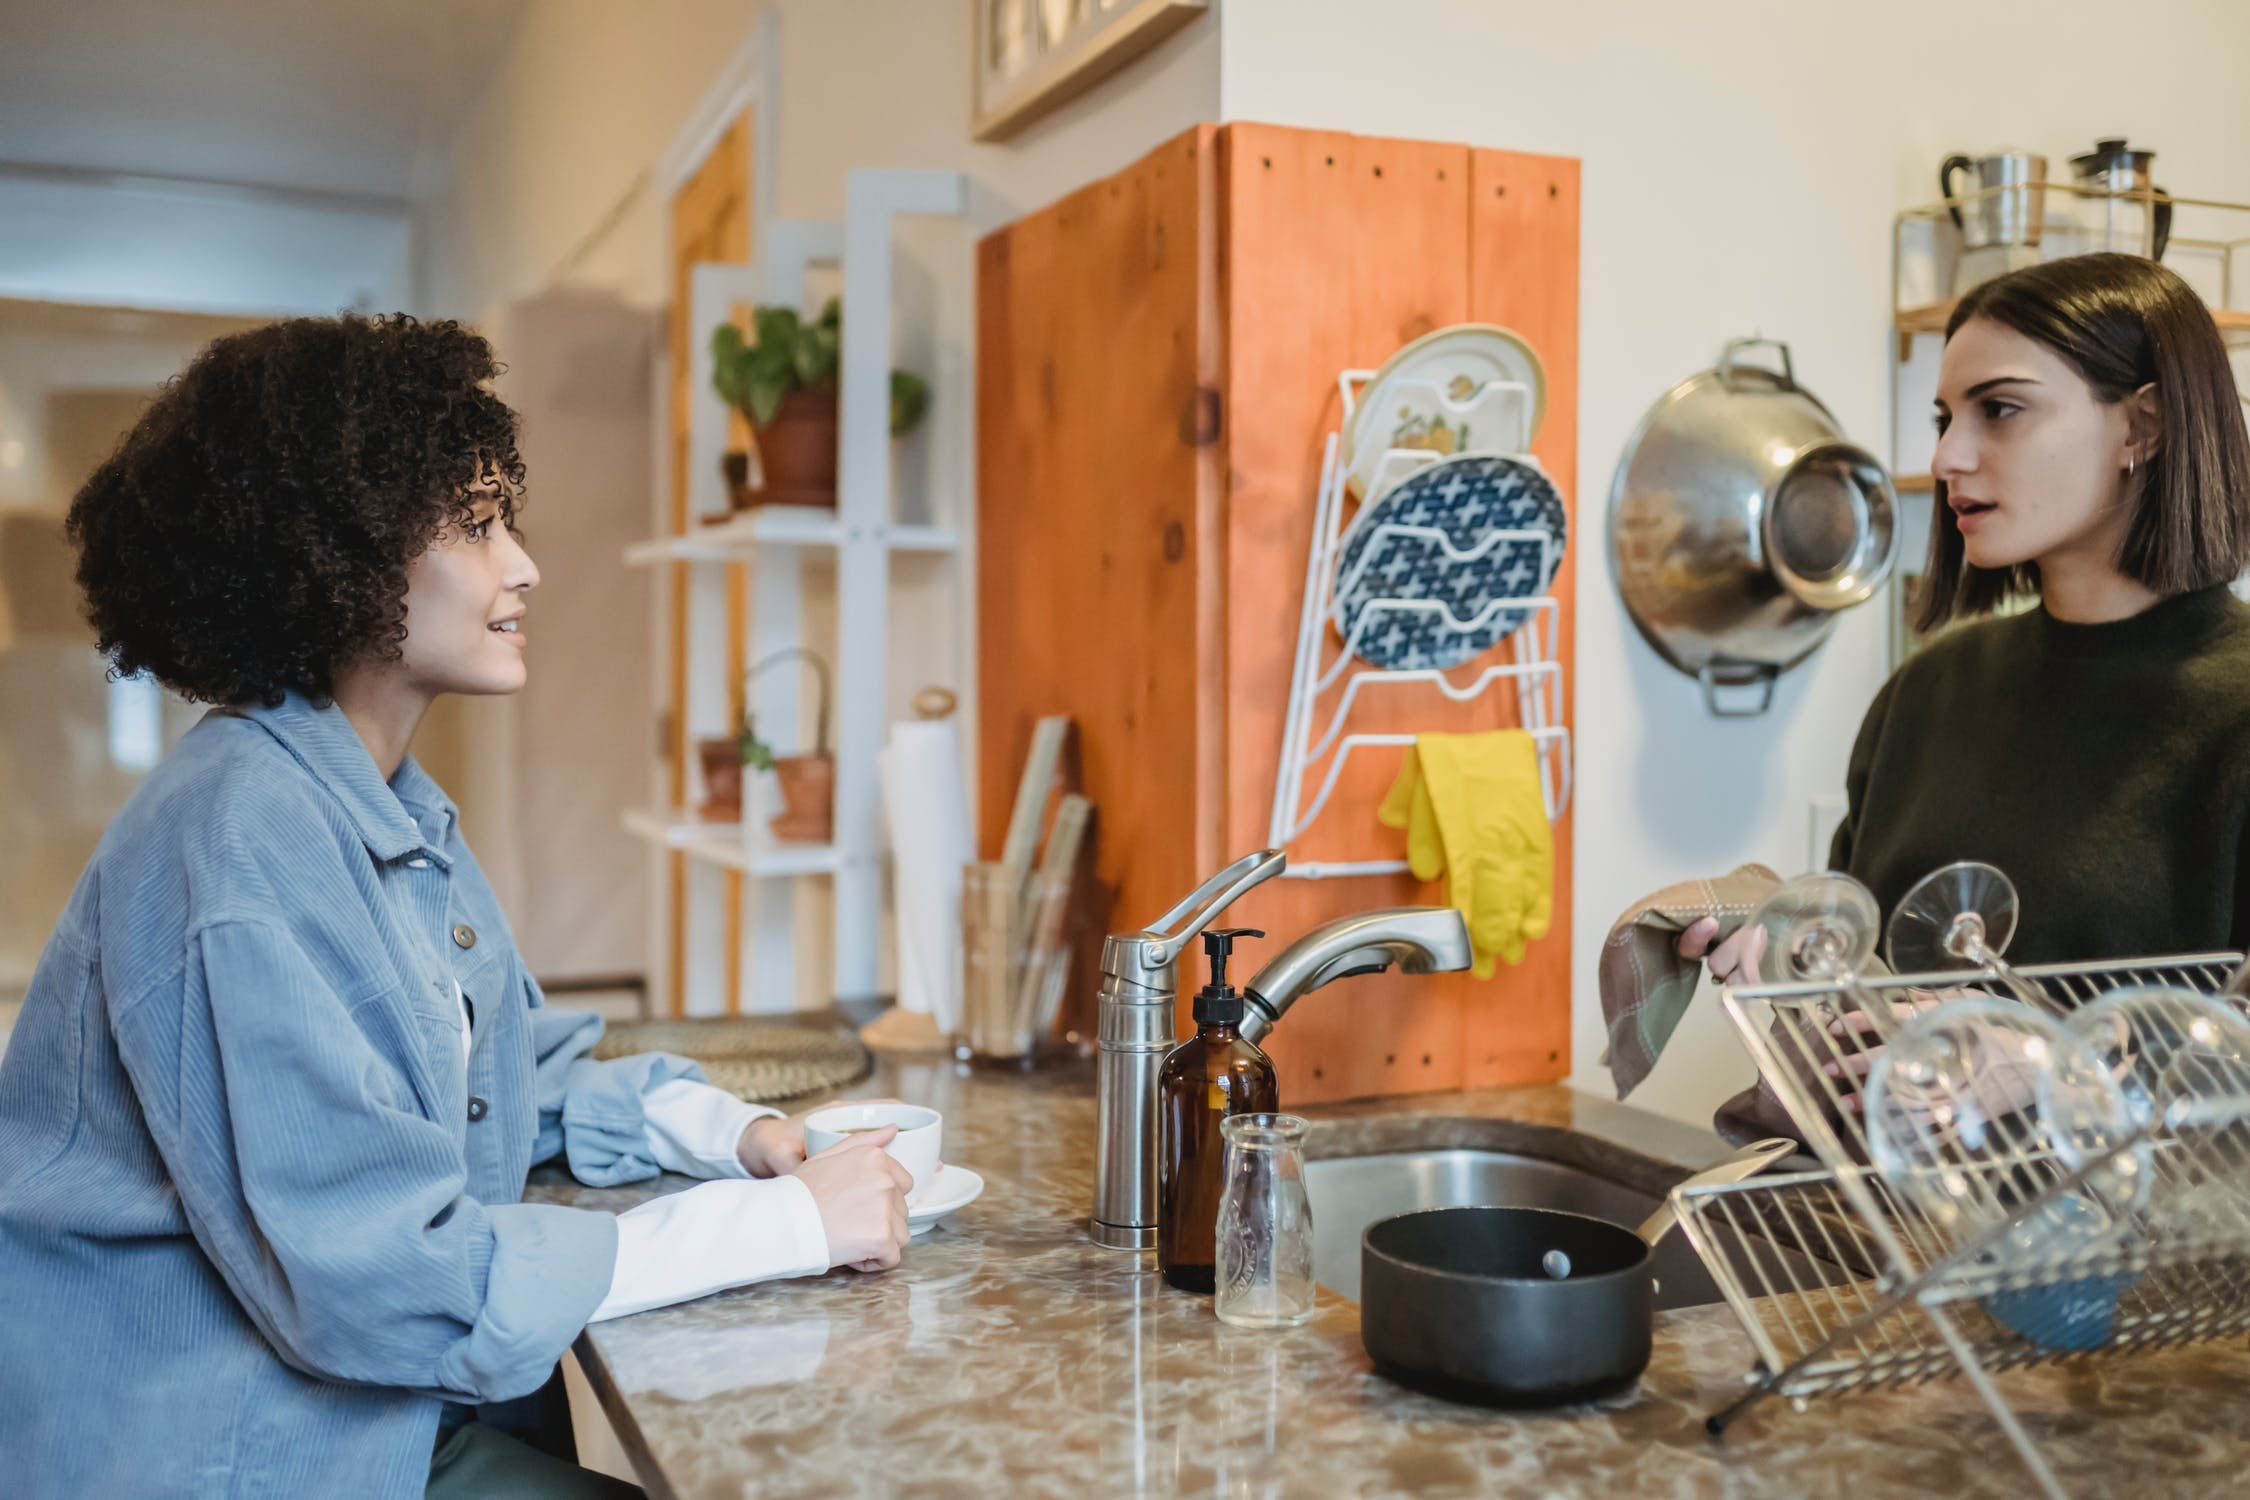 wholesale, yescomusa, household appliances